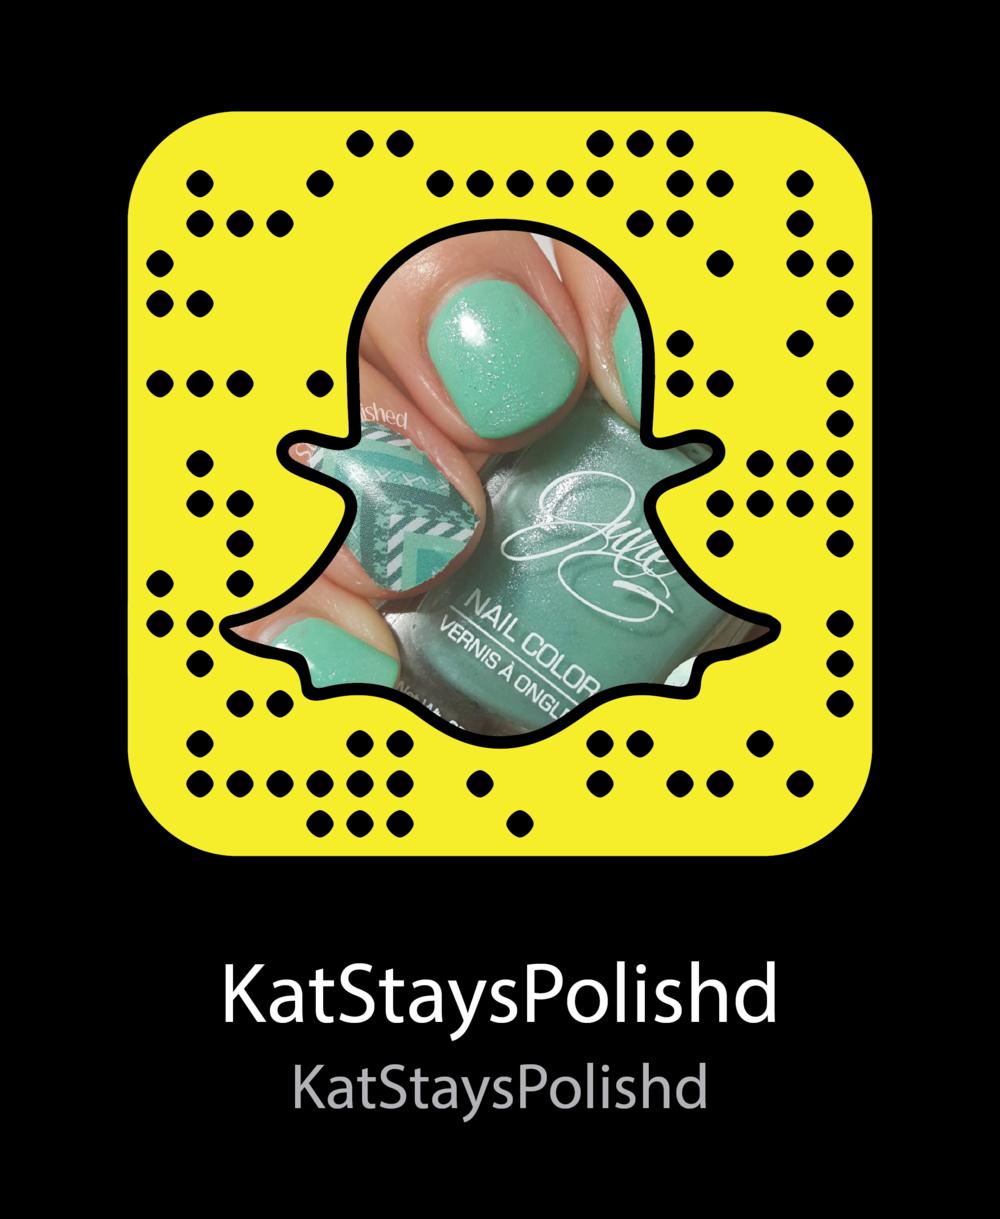 KatStaysPolishd-Beauty-Bloggers-snapchat-snapcode.png